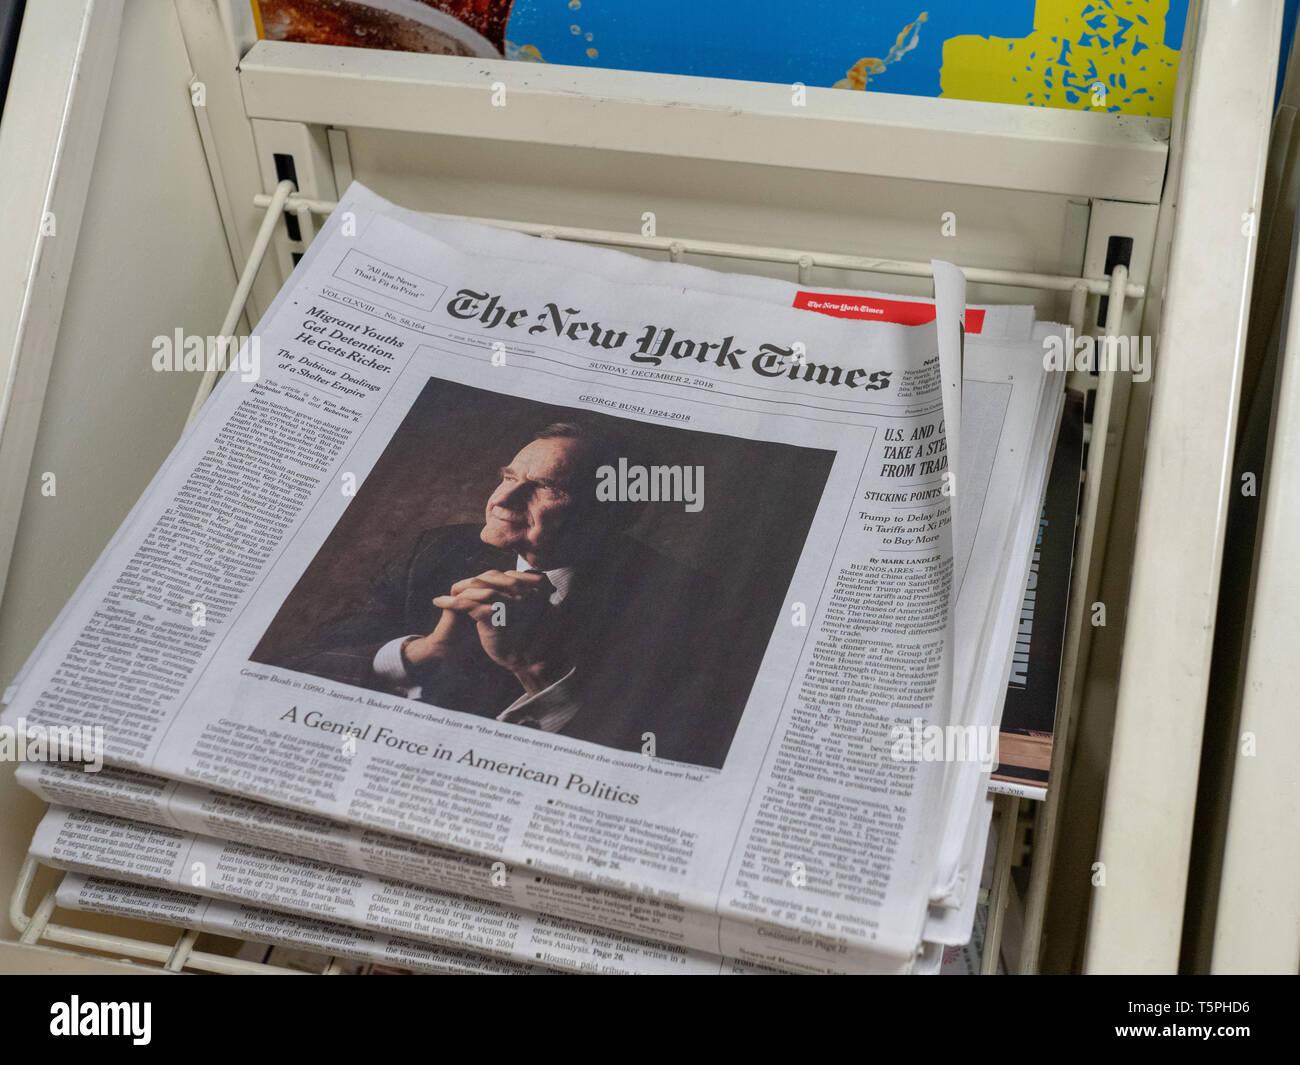 Tapa del New York Times de la muerte de George H.W. Bush Imagen De Stock